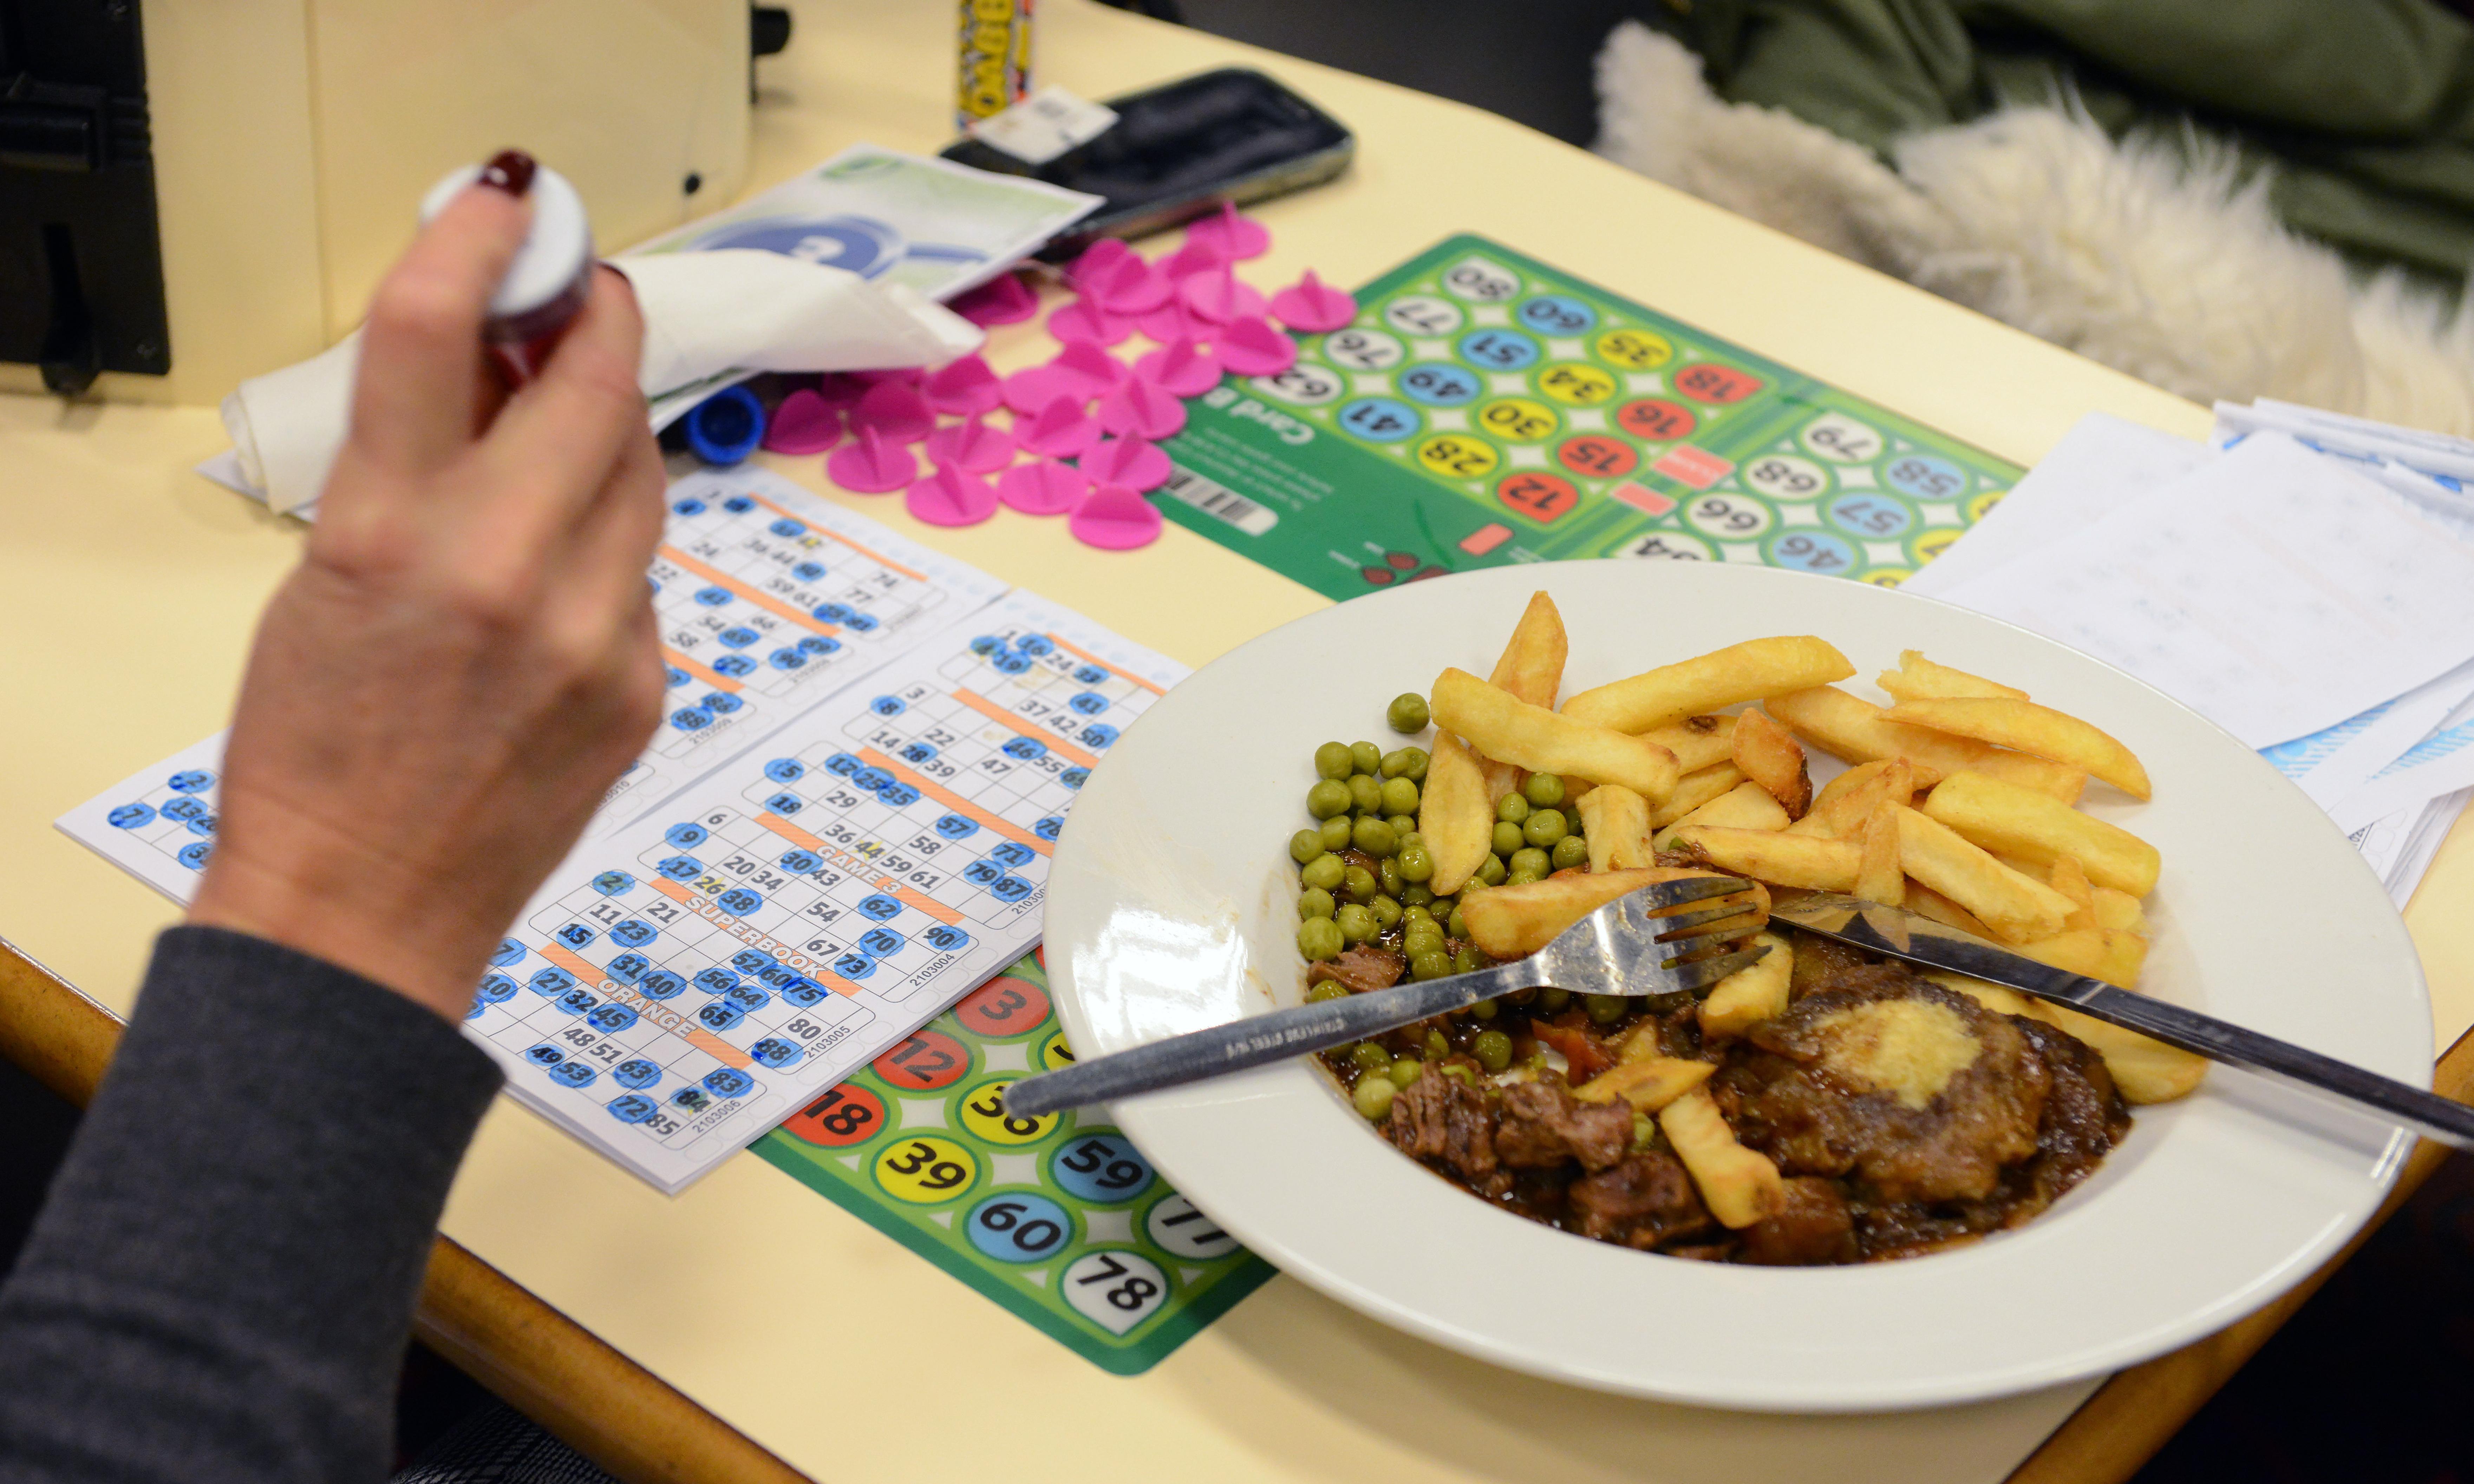 'Brexit menu': Mecca Bingo owner ready for no-deal departure